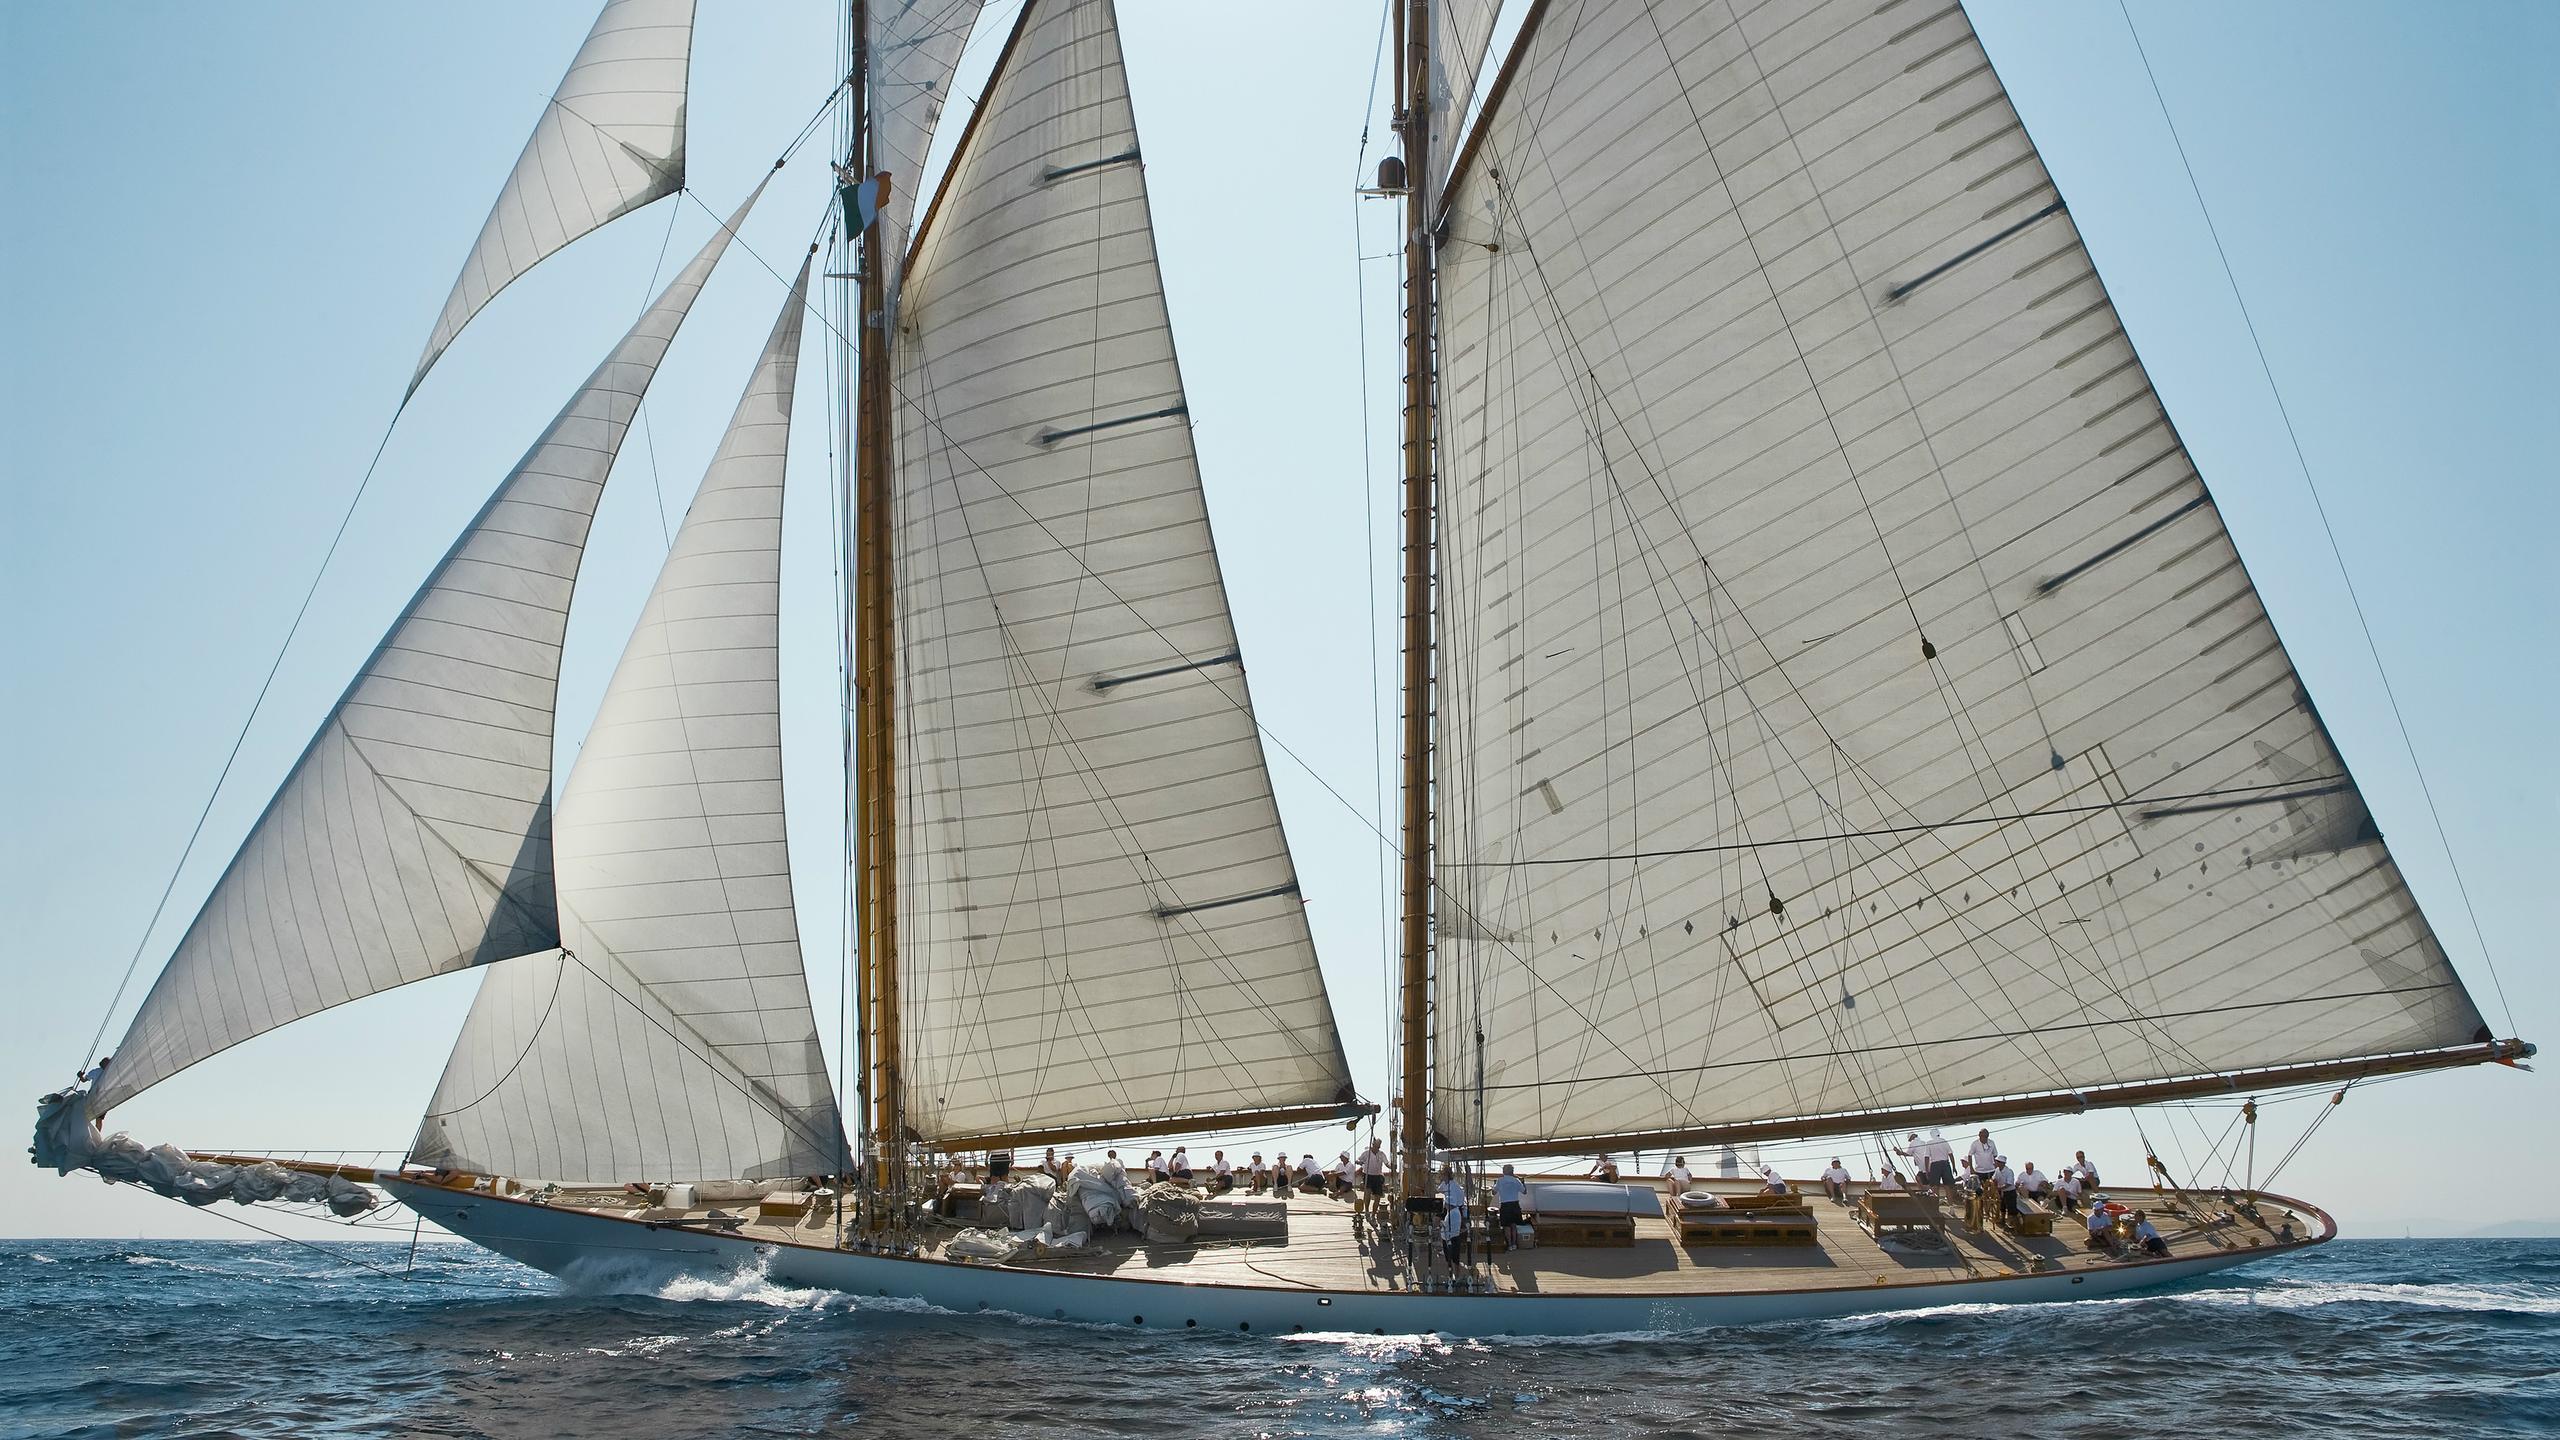 eleonora-e-sailing-yacht-van-der-graaf-2000-59m-profile